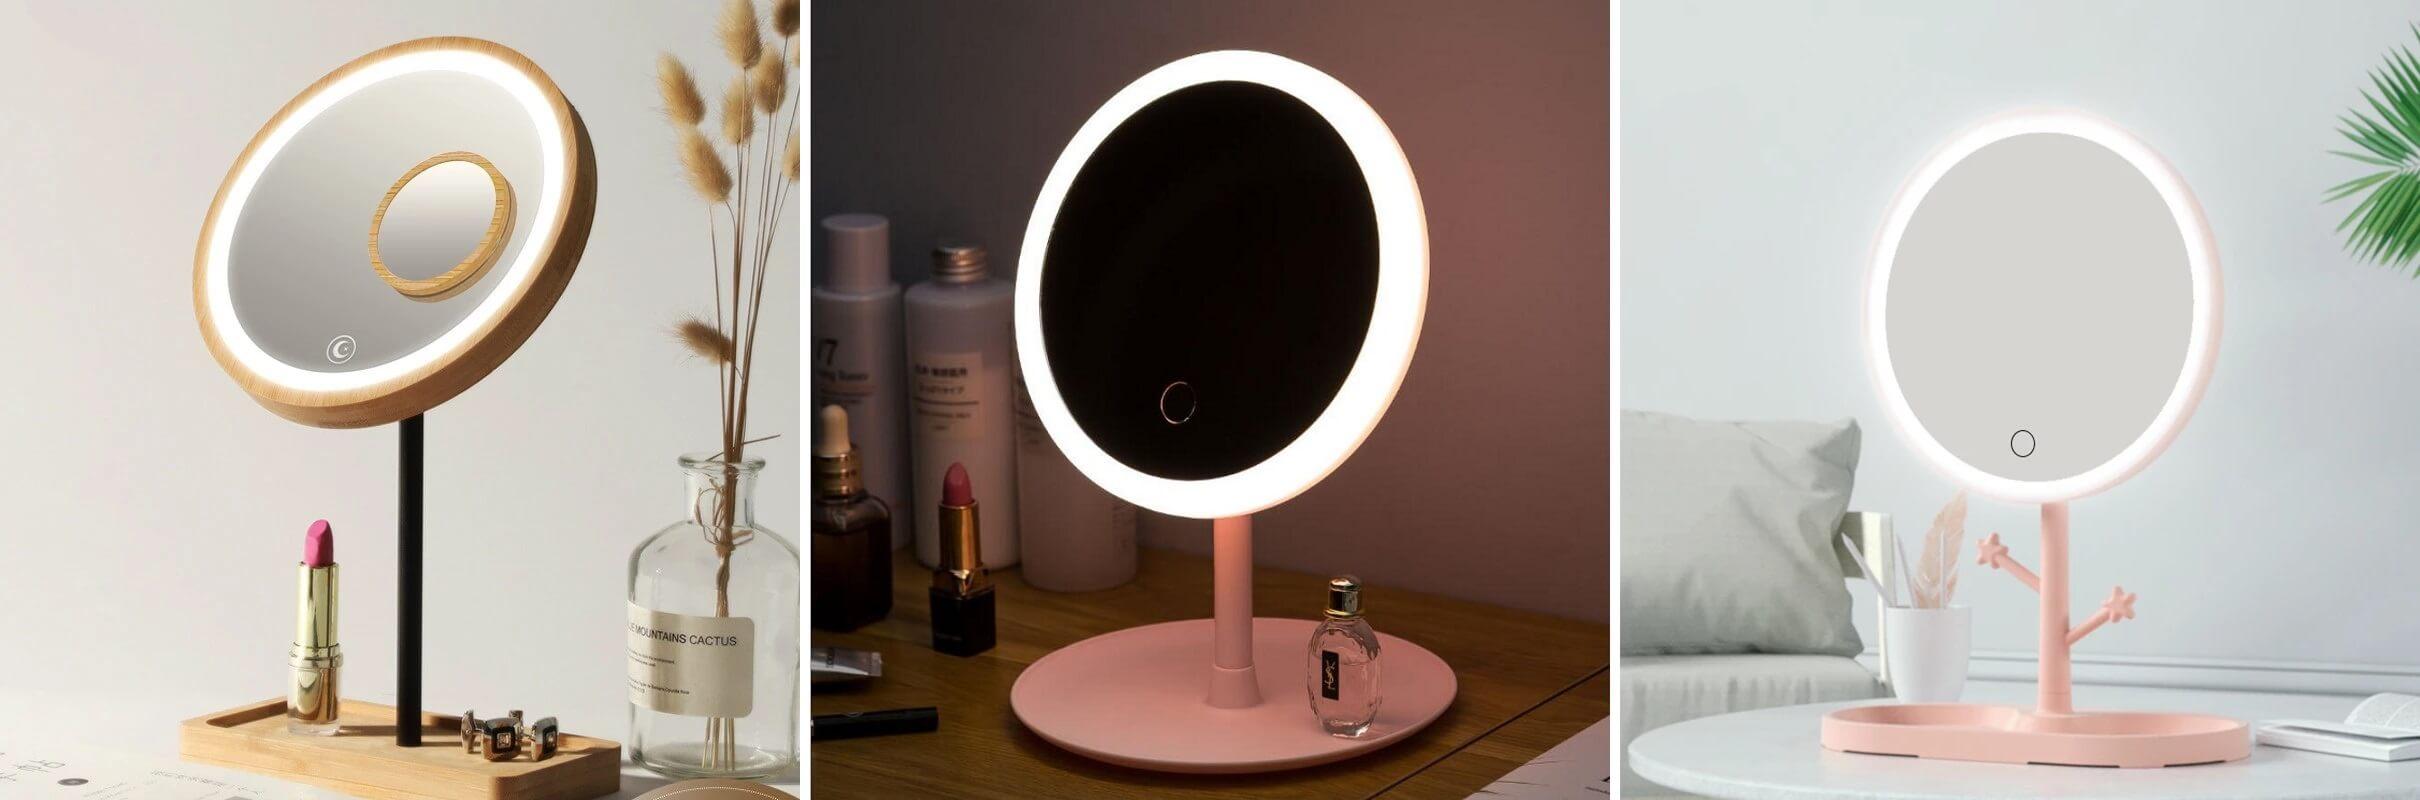 ТОП-10 зеркал с подсветкой с Алиэкспресс